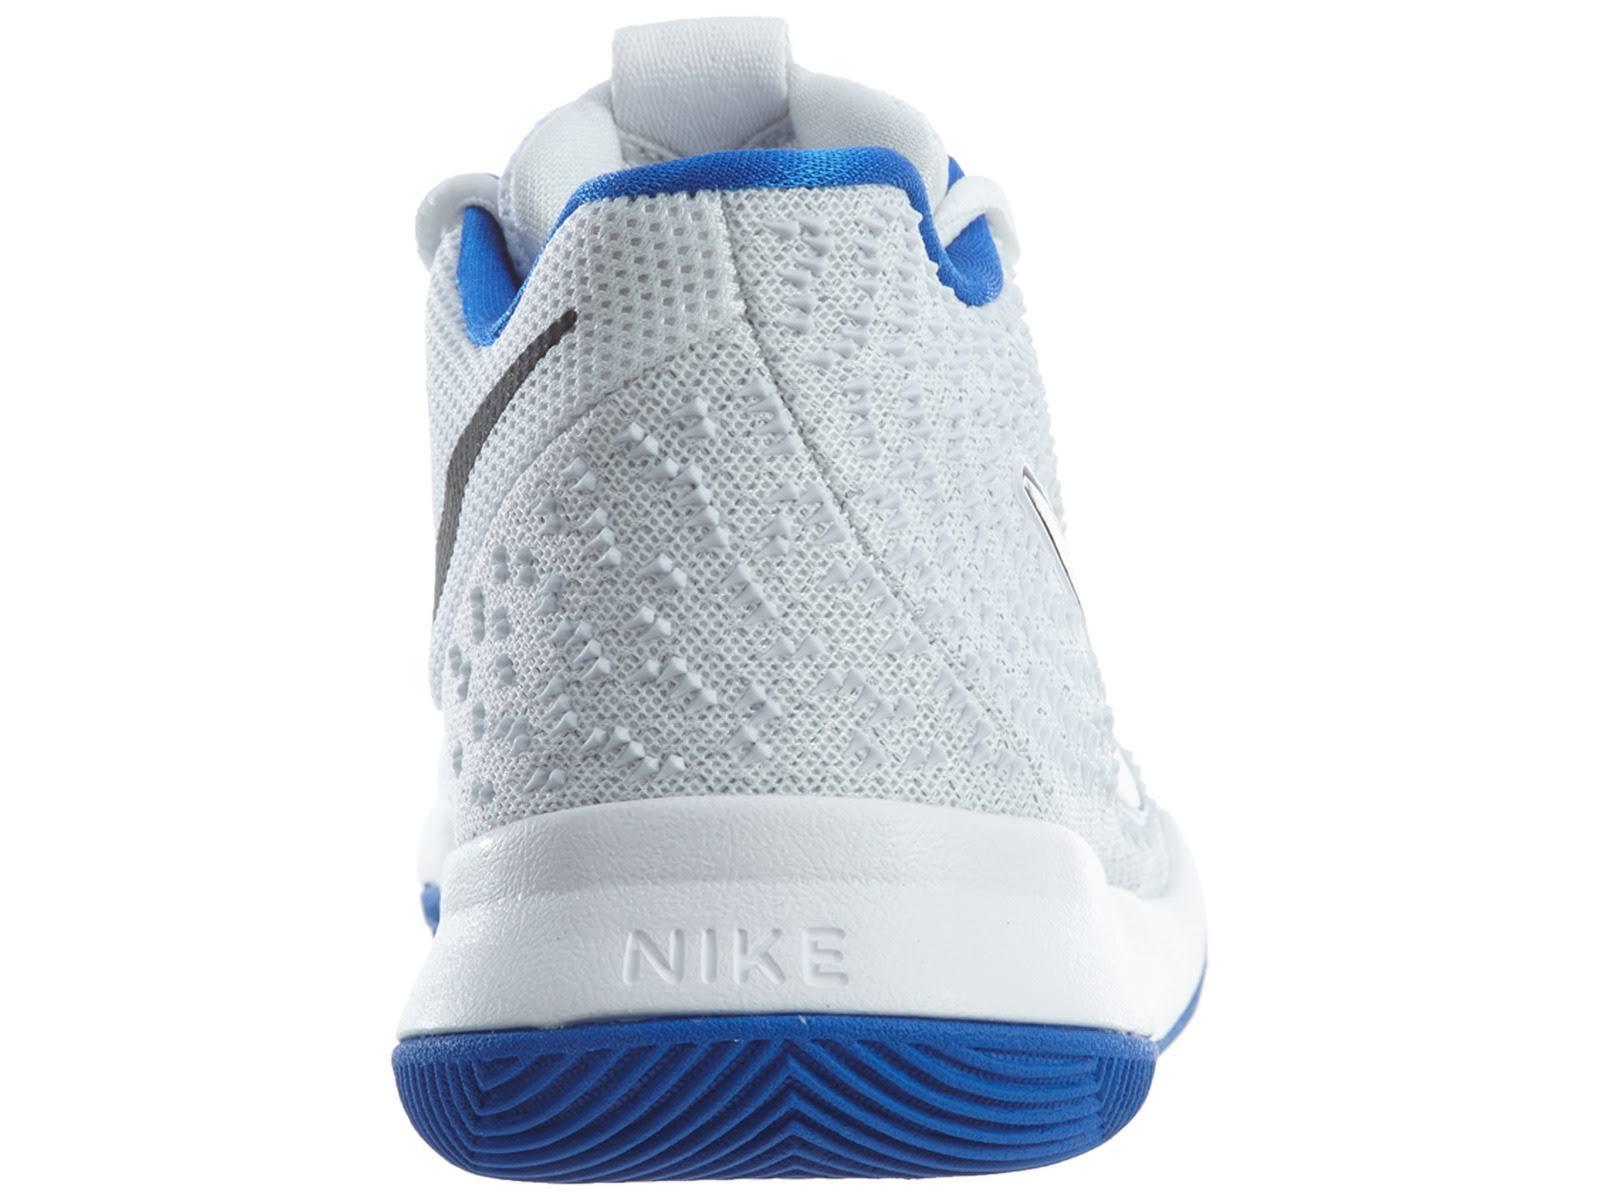 Hyper 7y Kyrie Size Gs black White White Cobalt Youth 3 Nike fAqFxOx